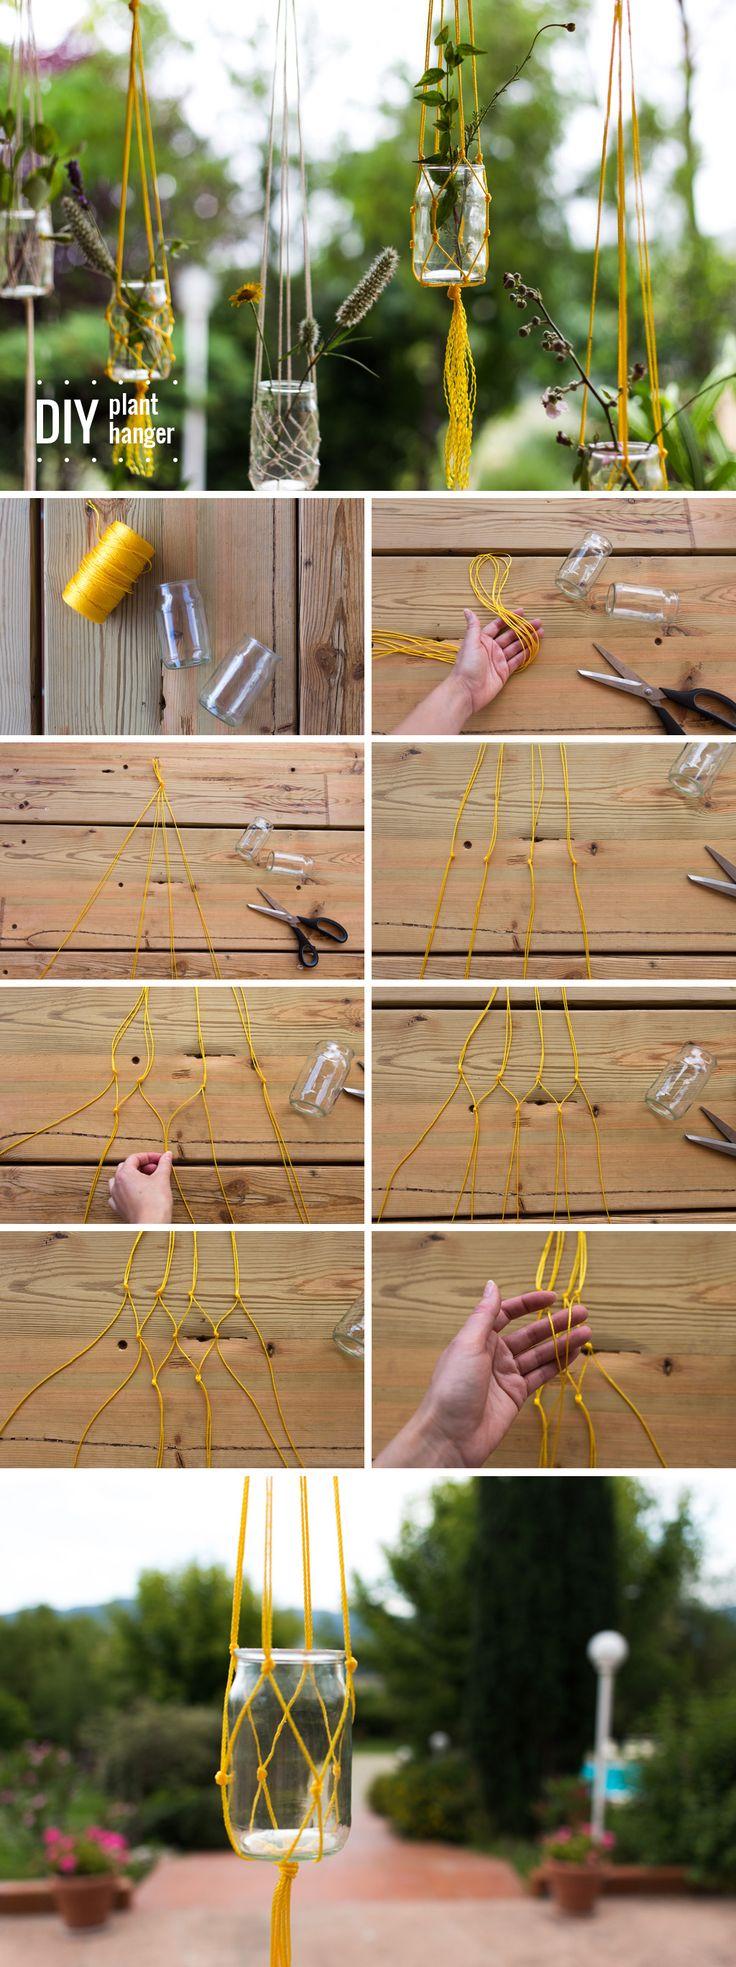 DIY: plant hanger                                                                                                                                                                                 More